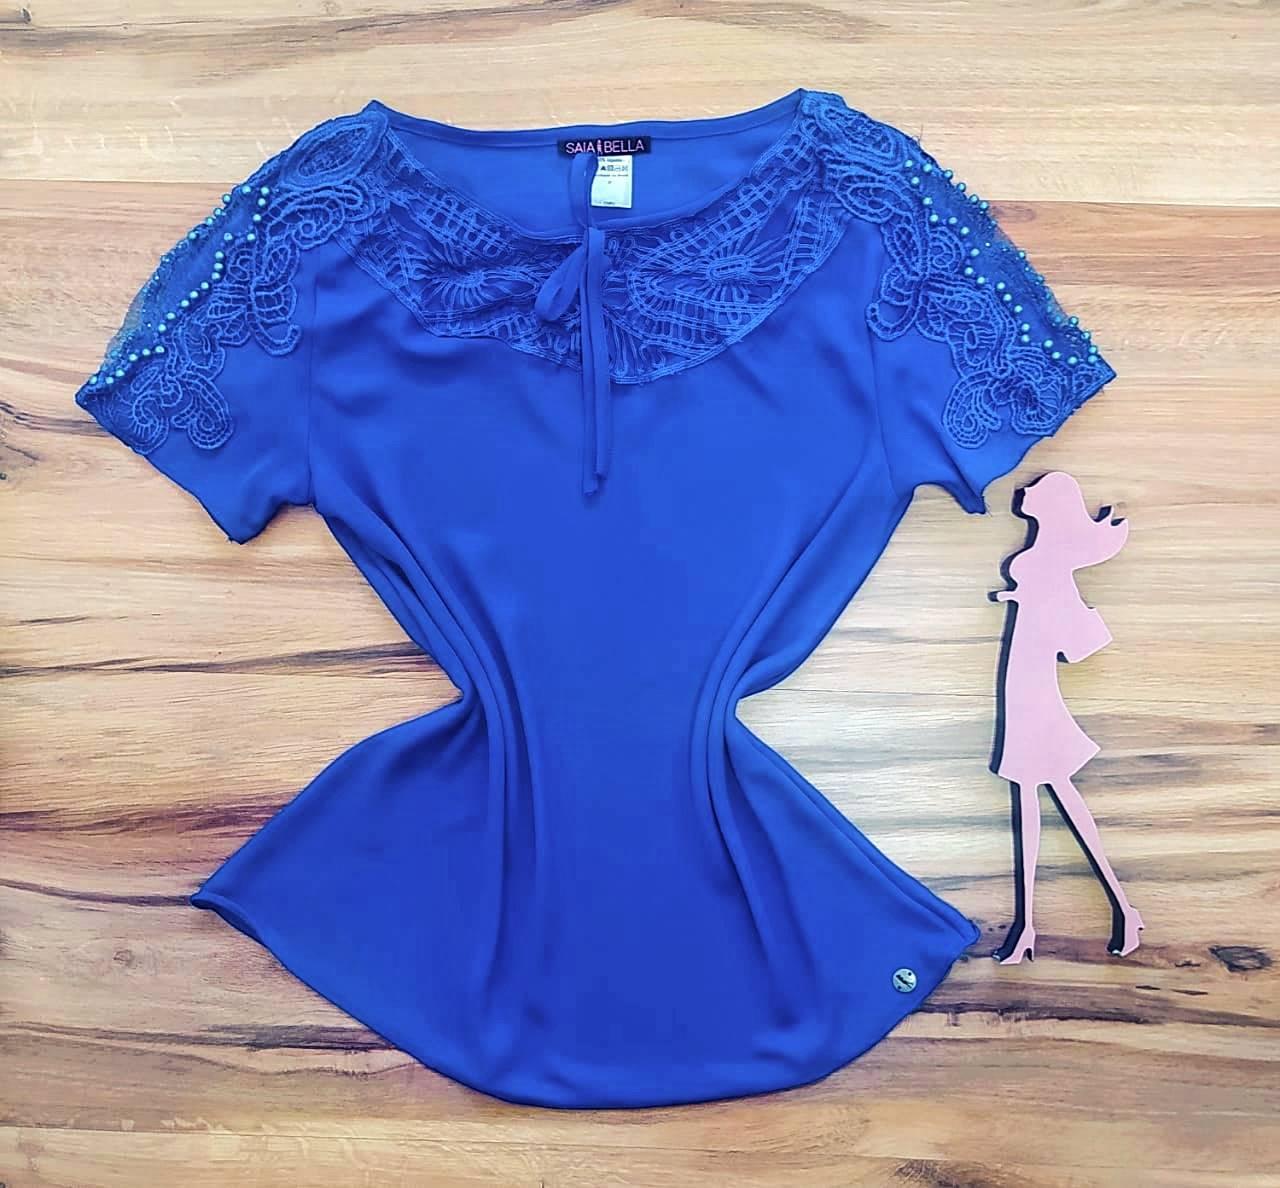 Blusa Ariana Saia Bella - SB700076 Azul Royal